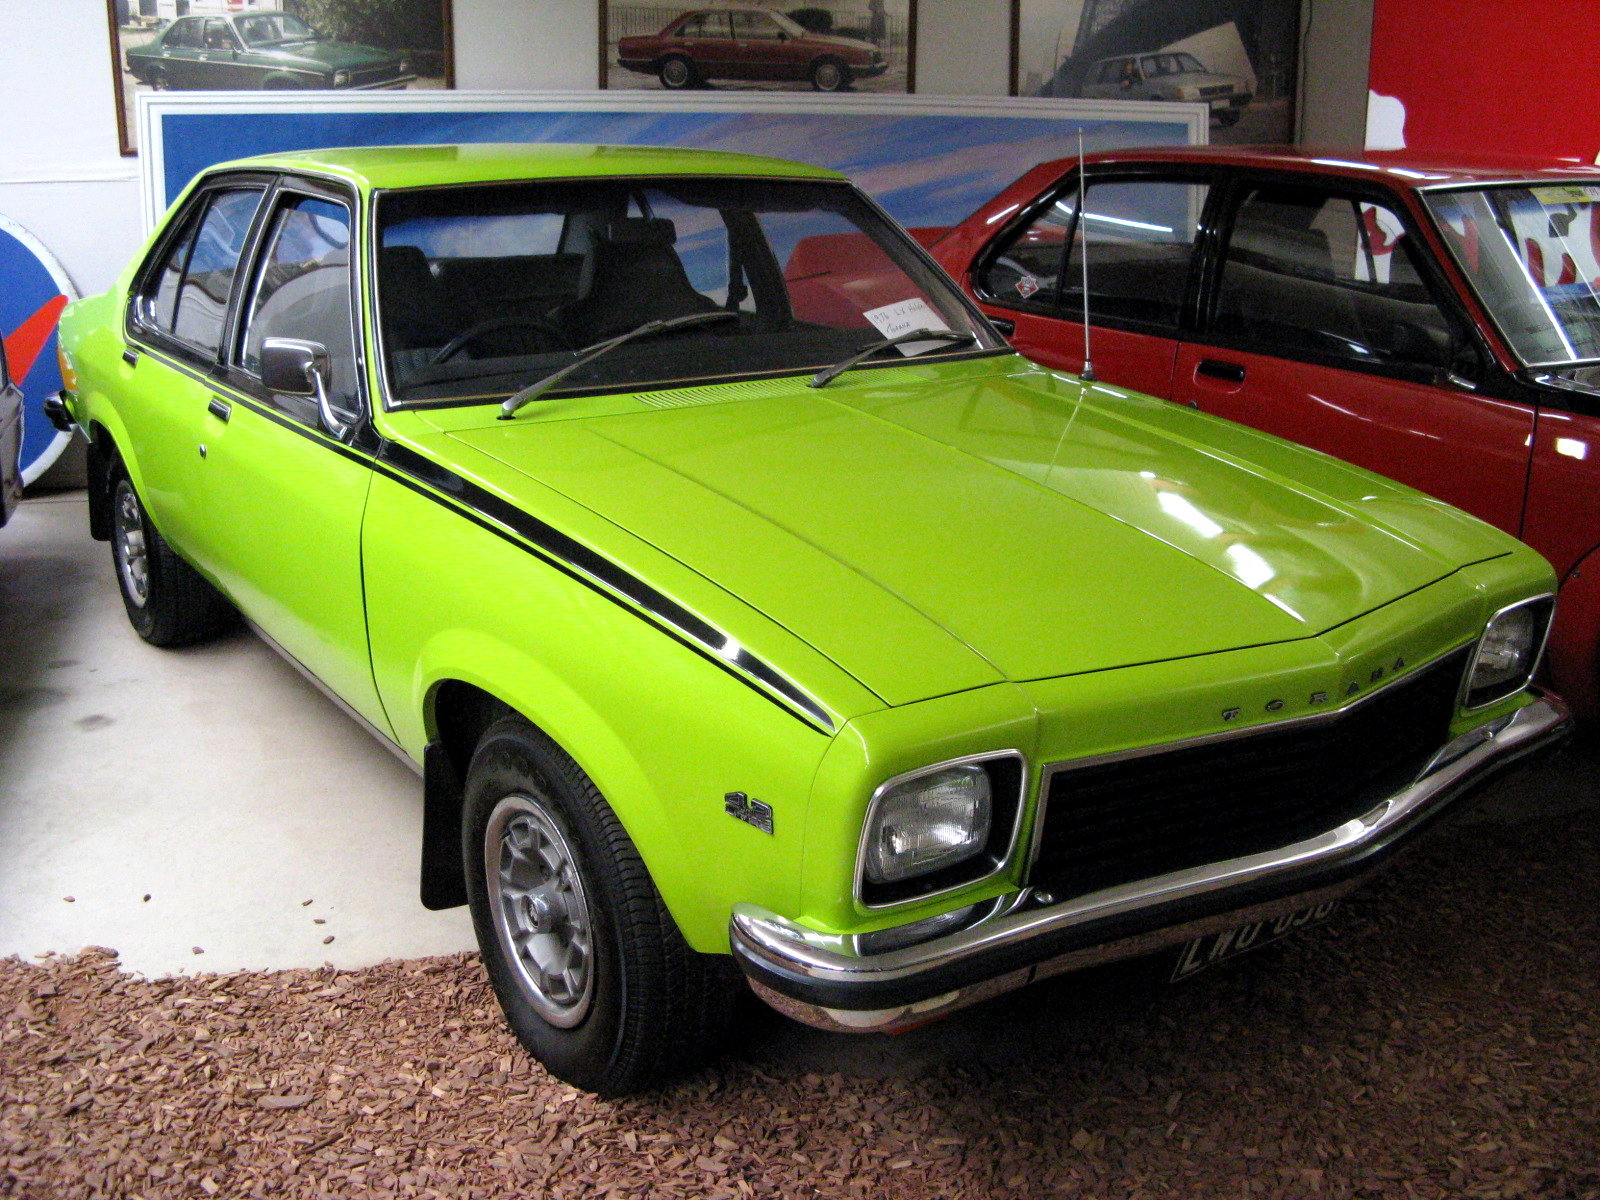 File:1974-1976 Holden Torana (LH) SLR sedan (2008-09-02 ...